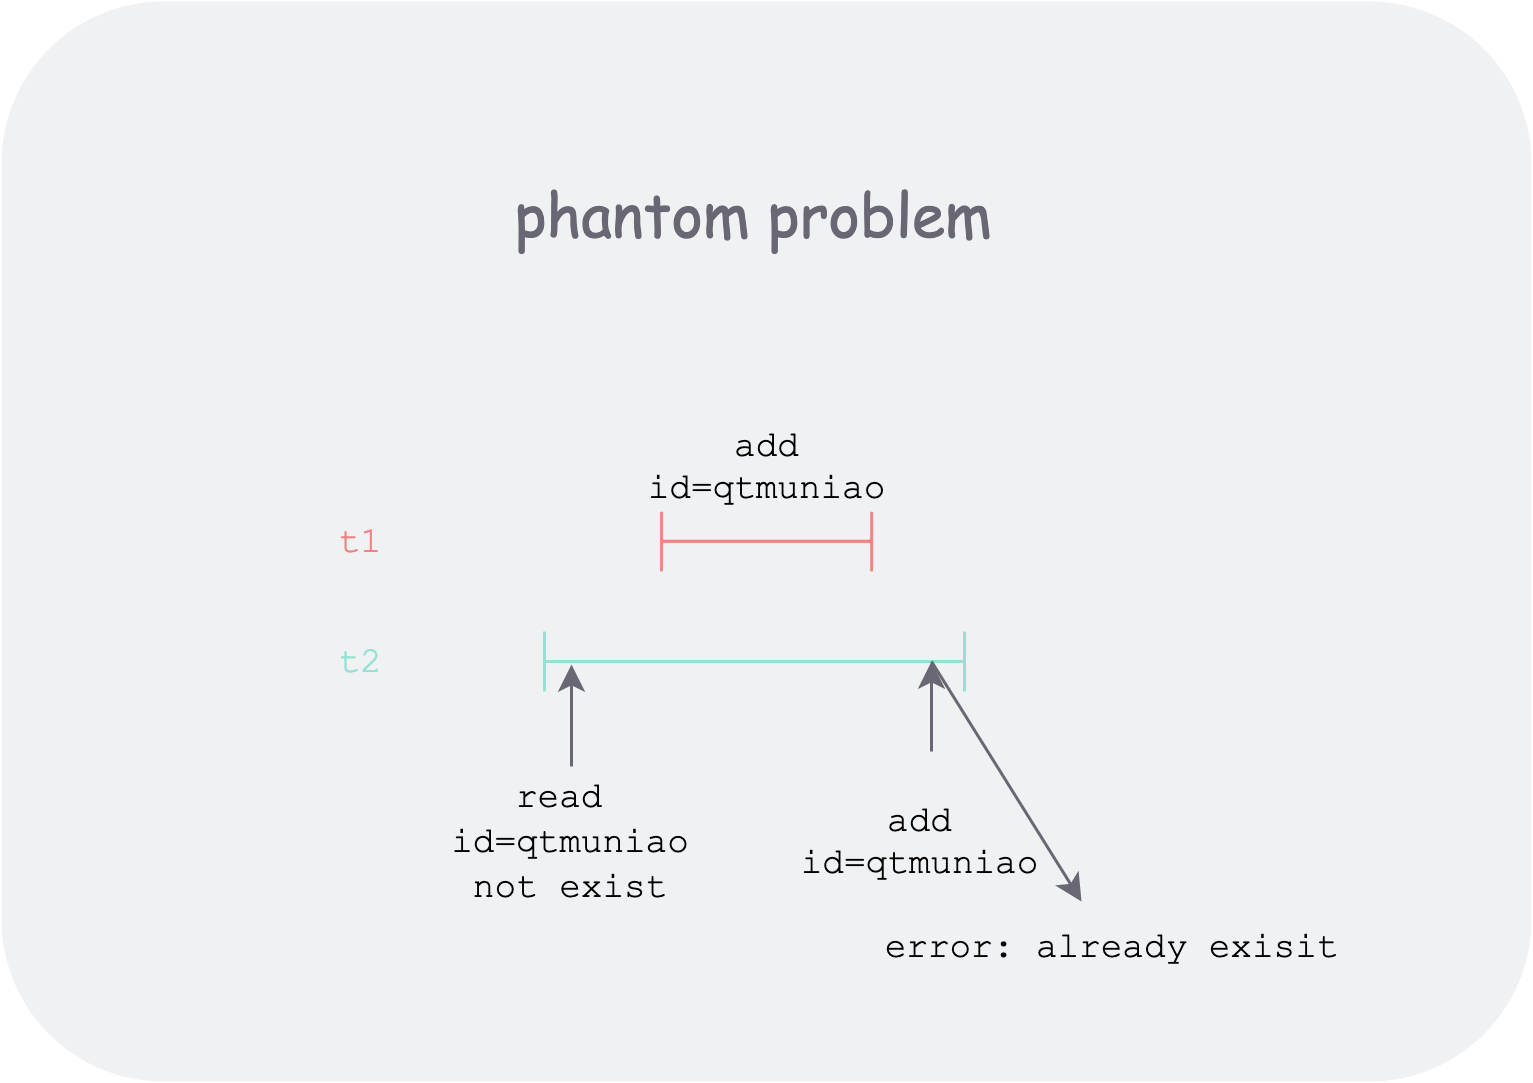 phantom-problem.png